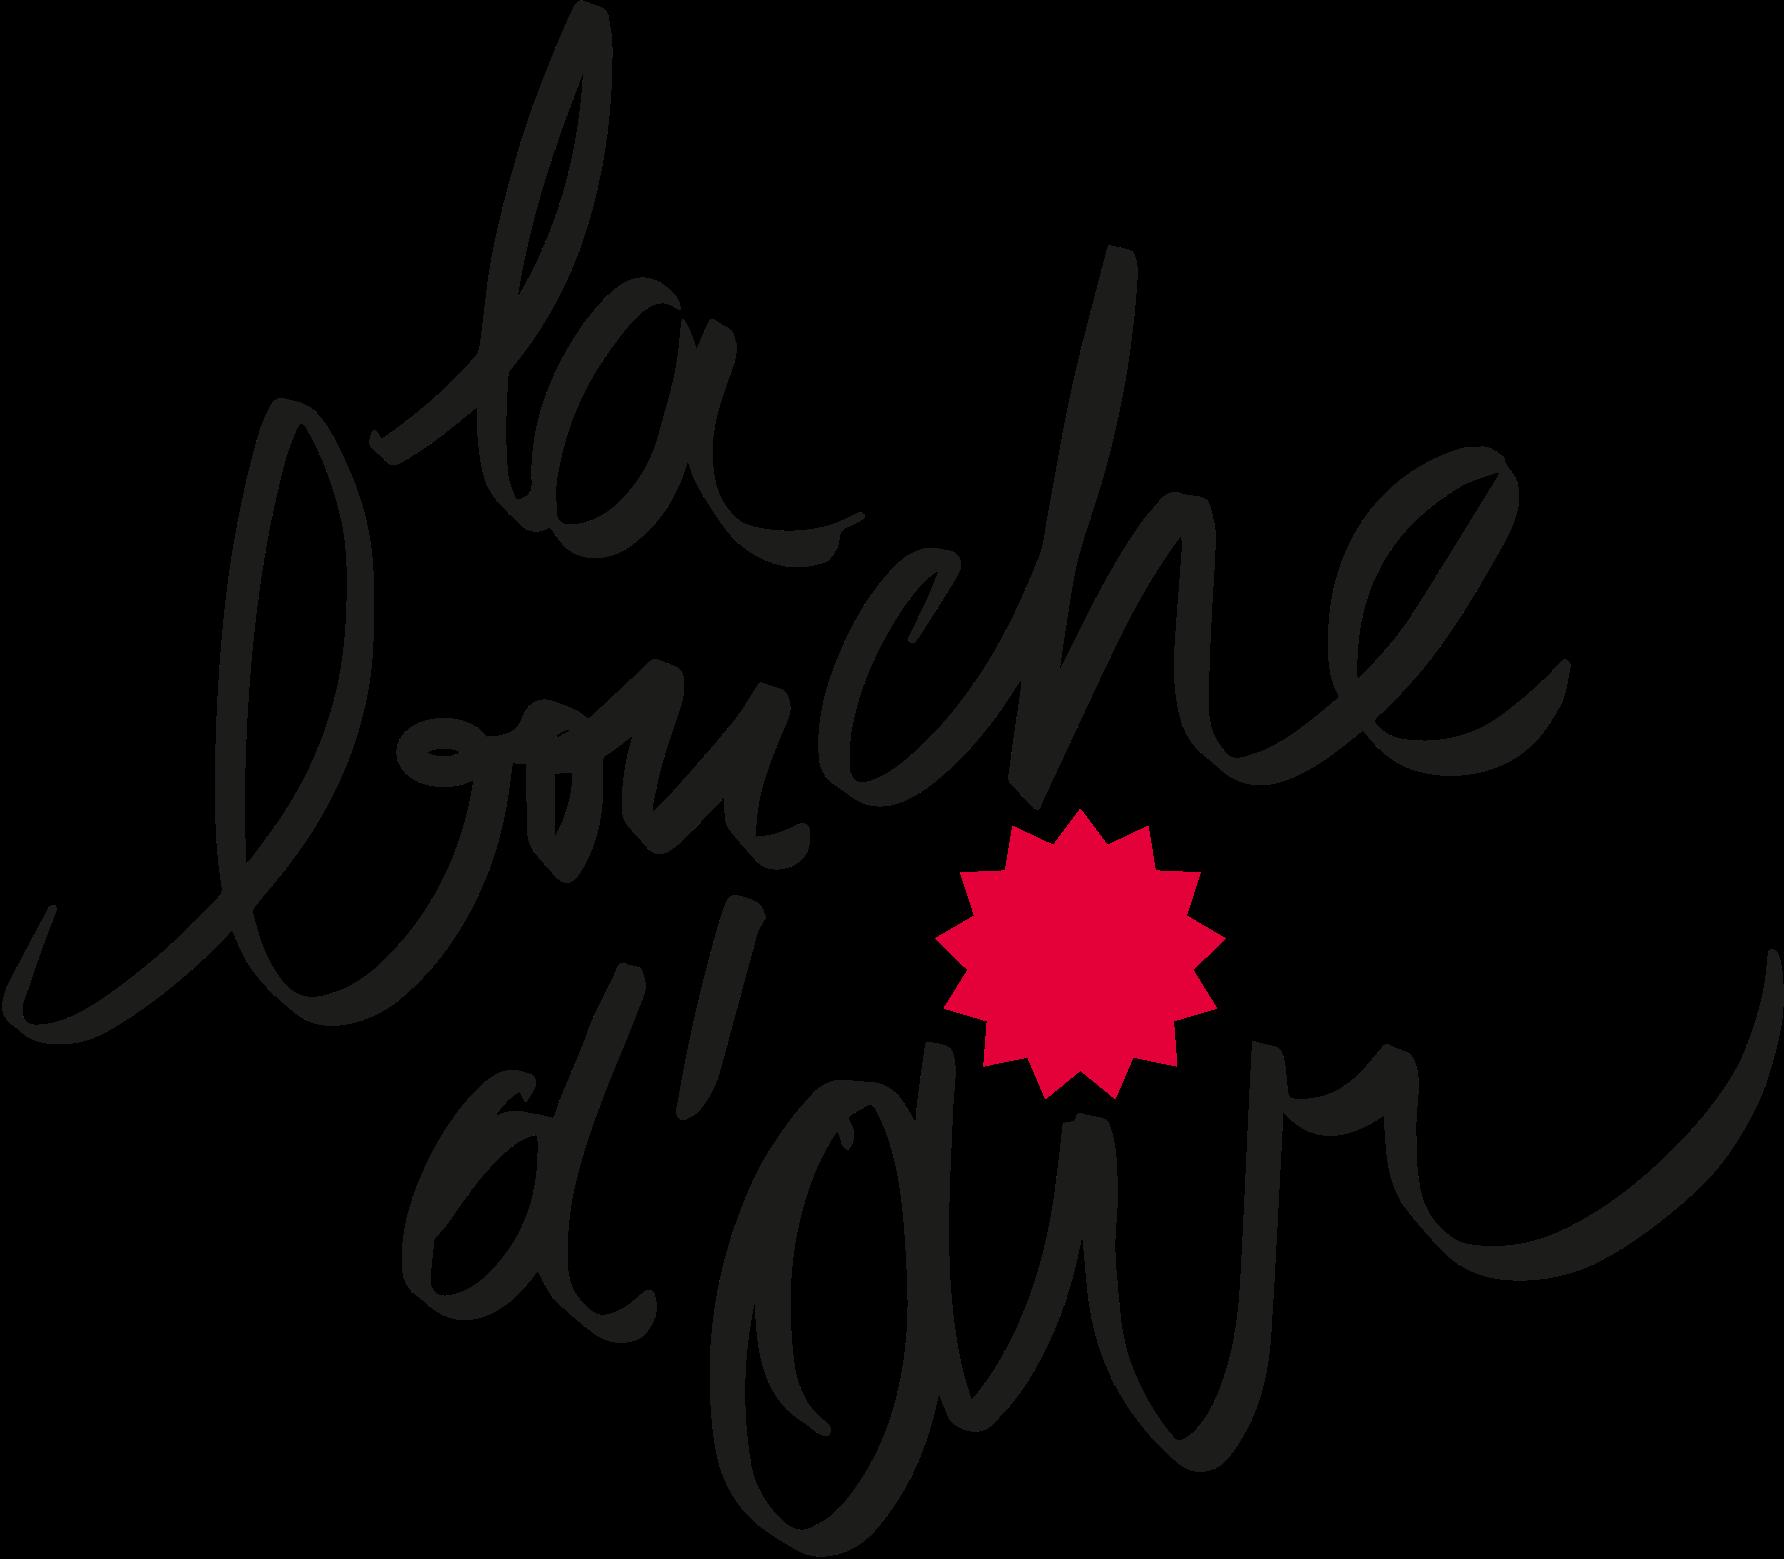 Logo Bouche d'air